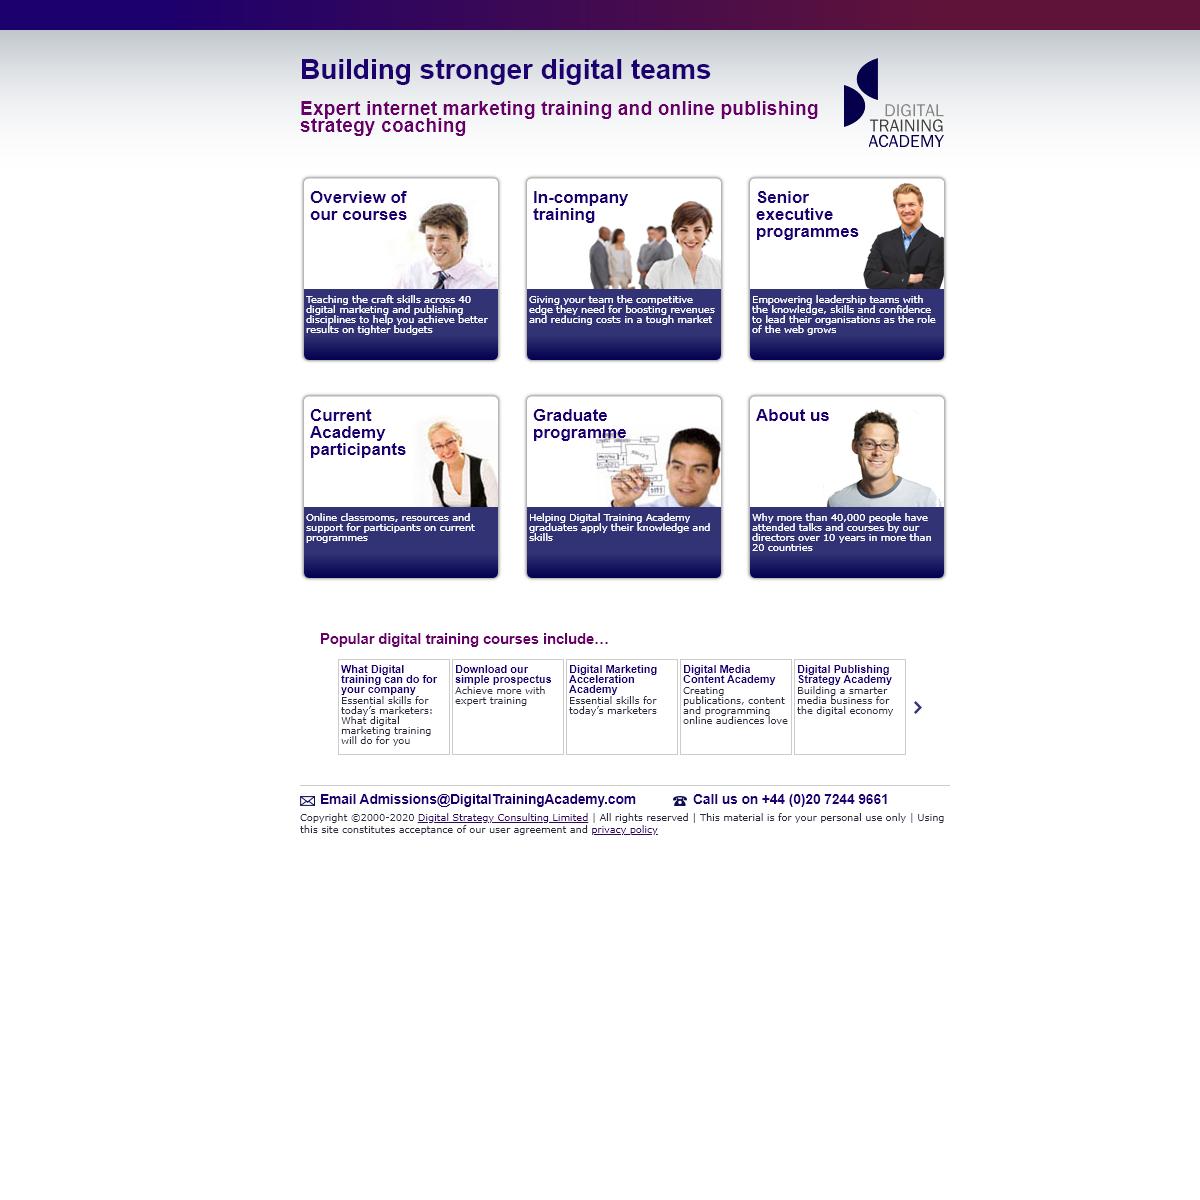 Digital Training Academy – Building stronger digital teams